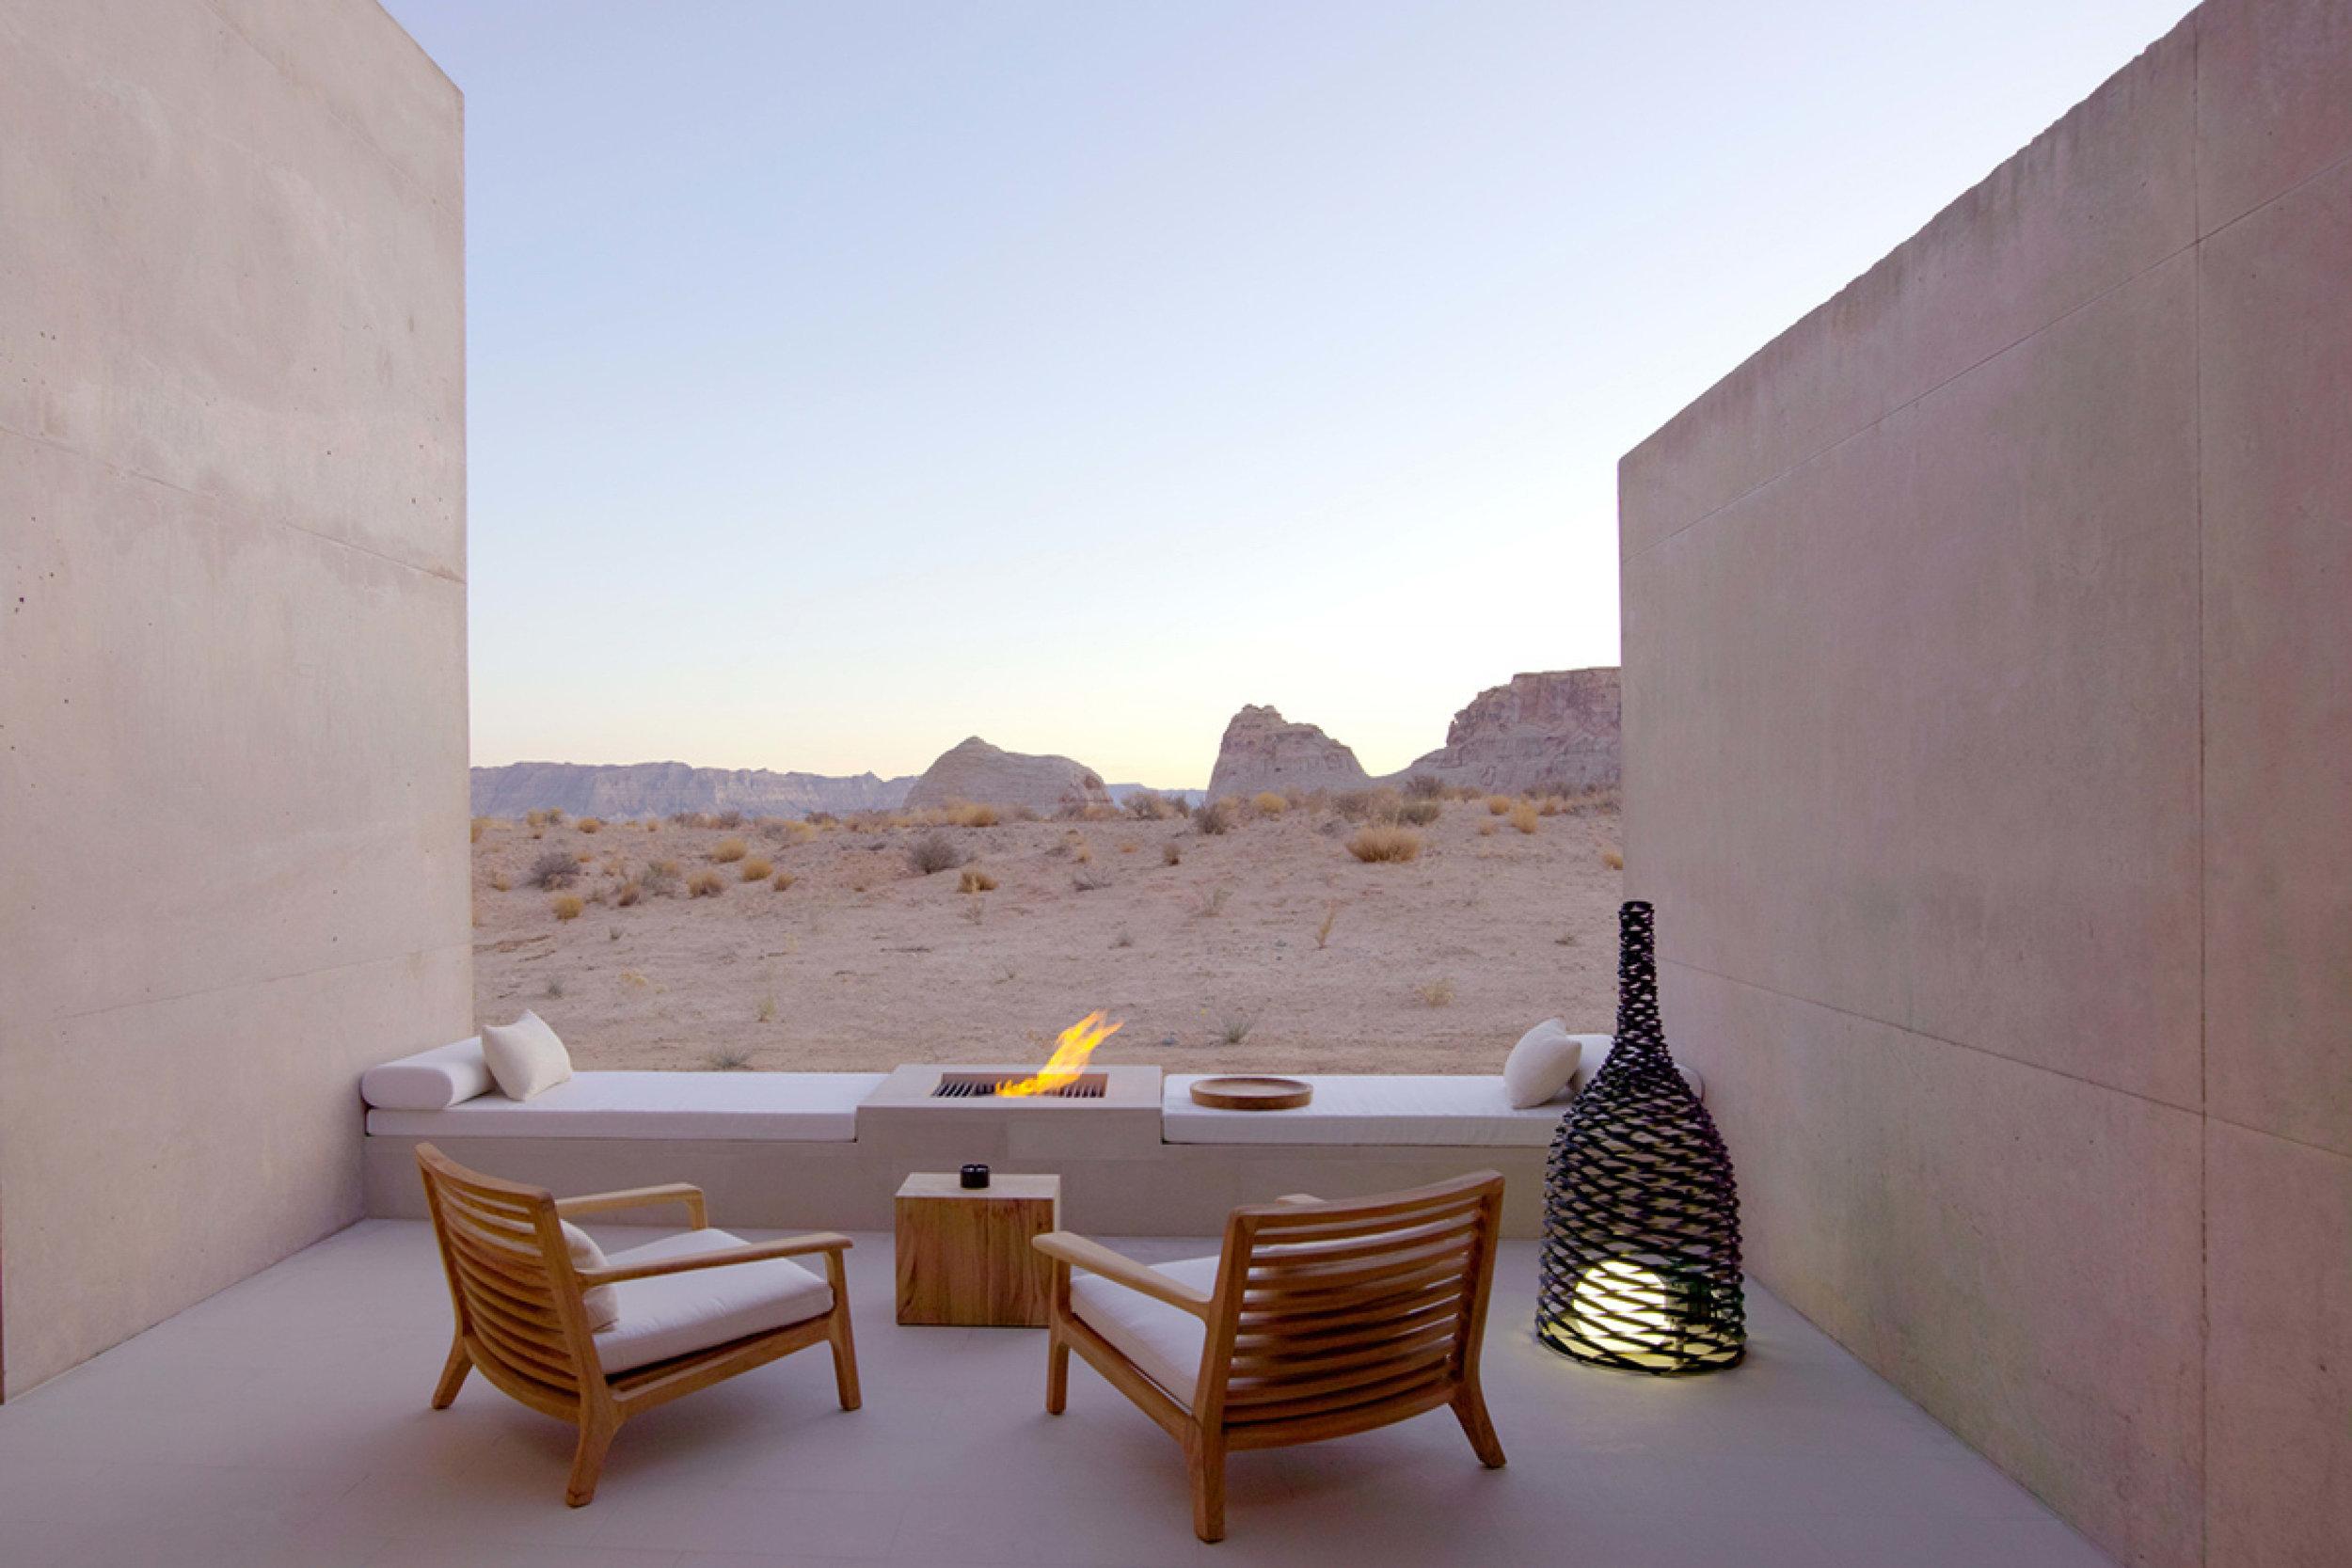 amangiri_amangiri_suite_desert_lounge_office_3153.jpg